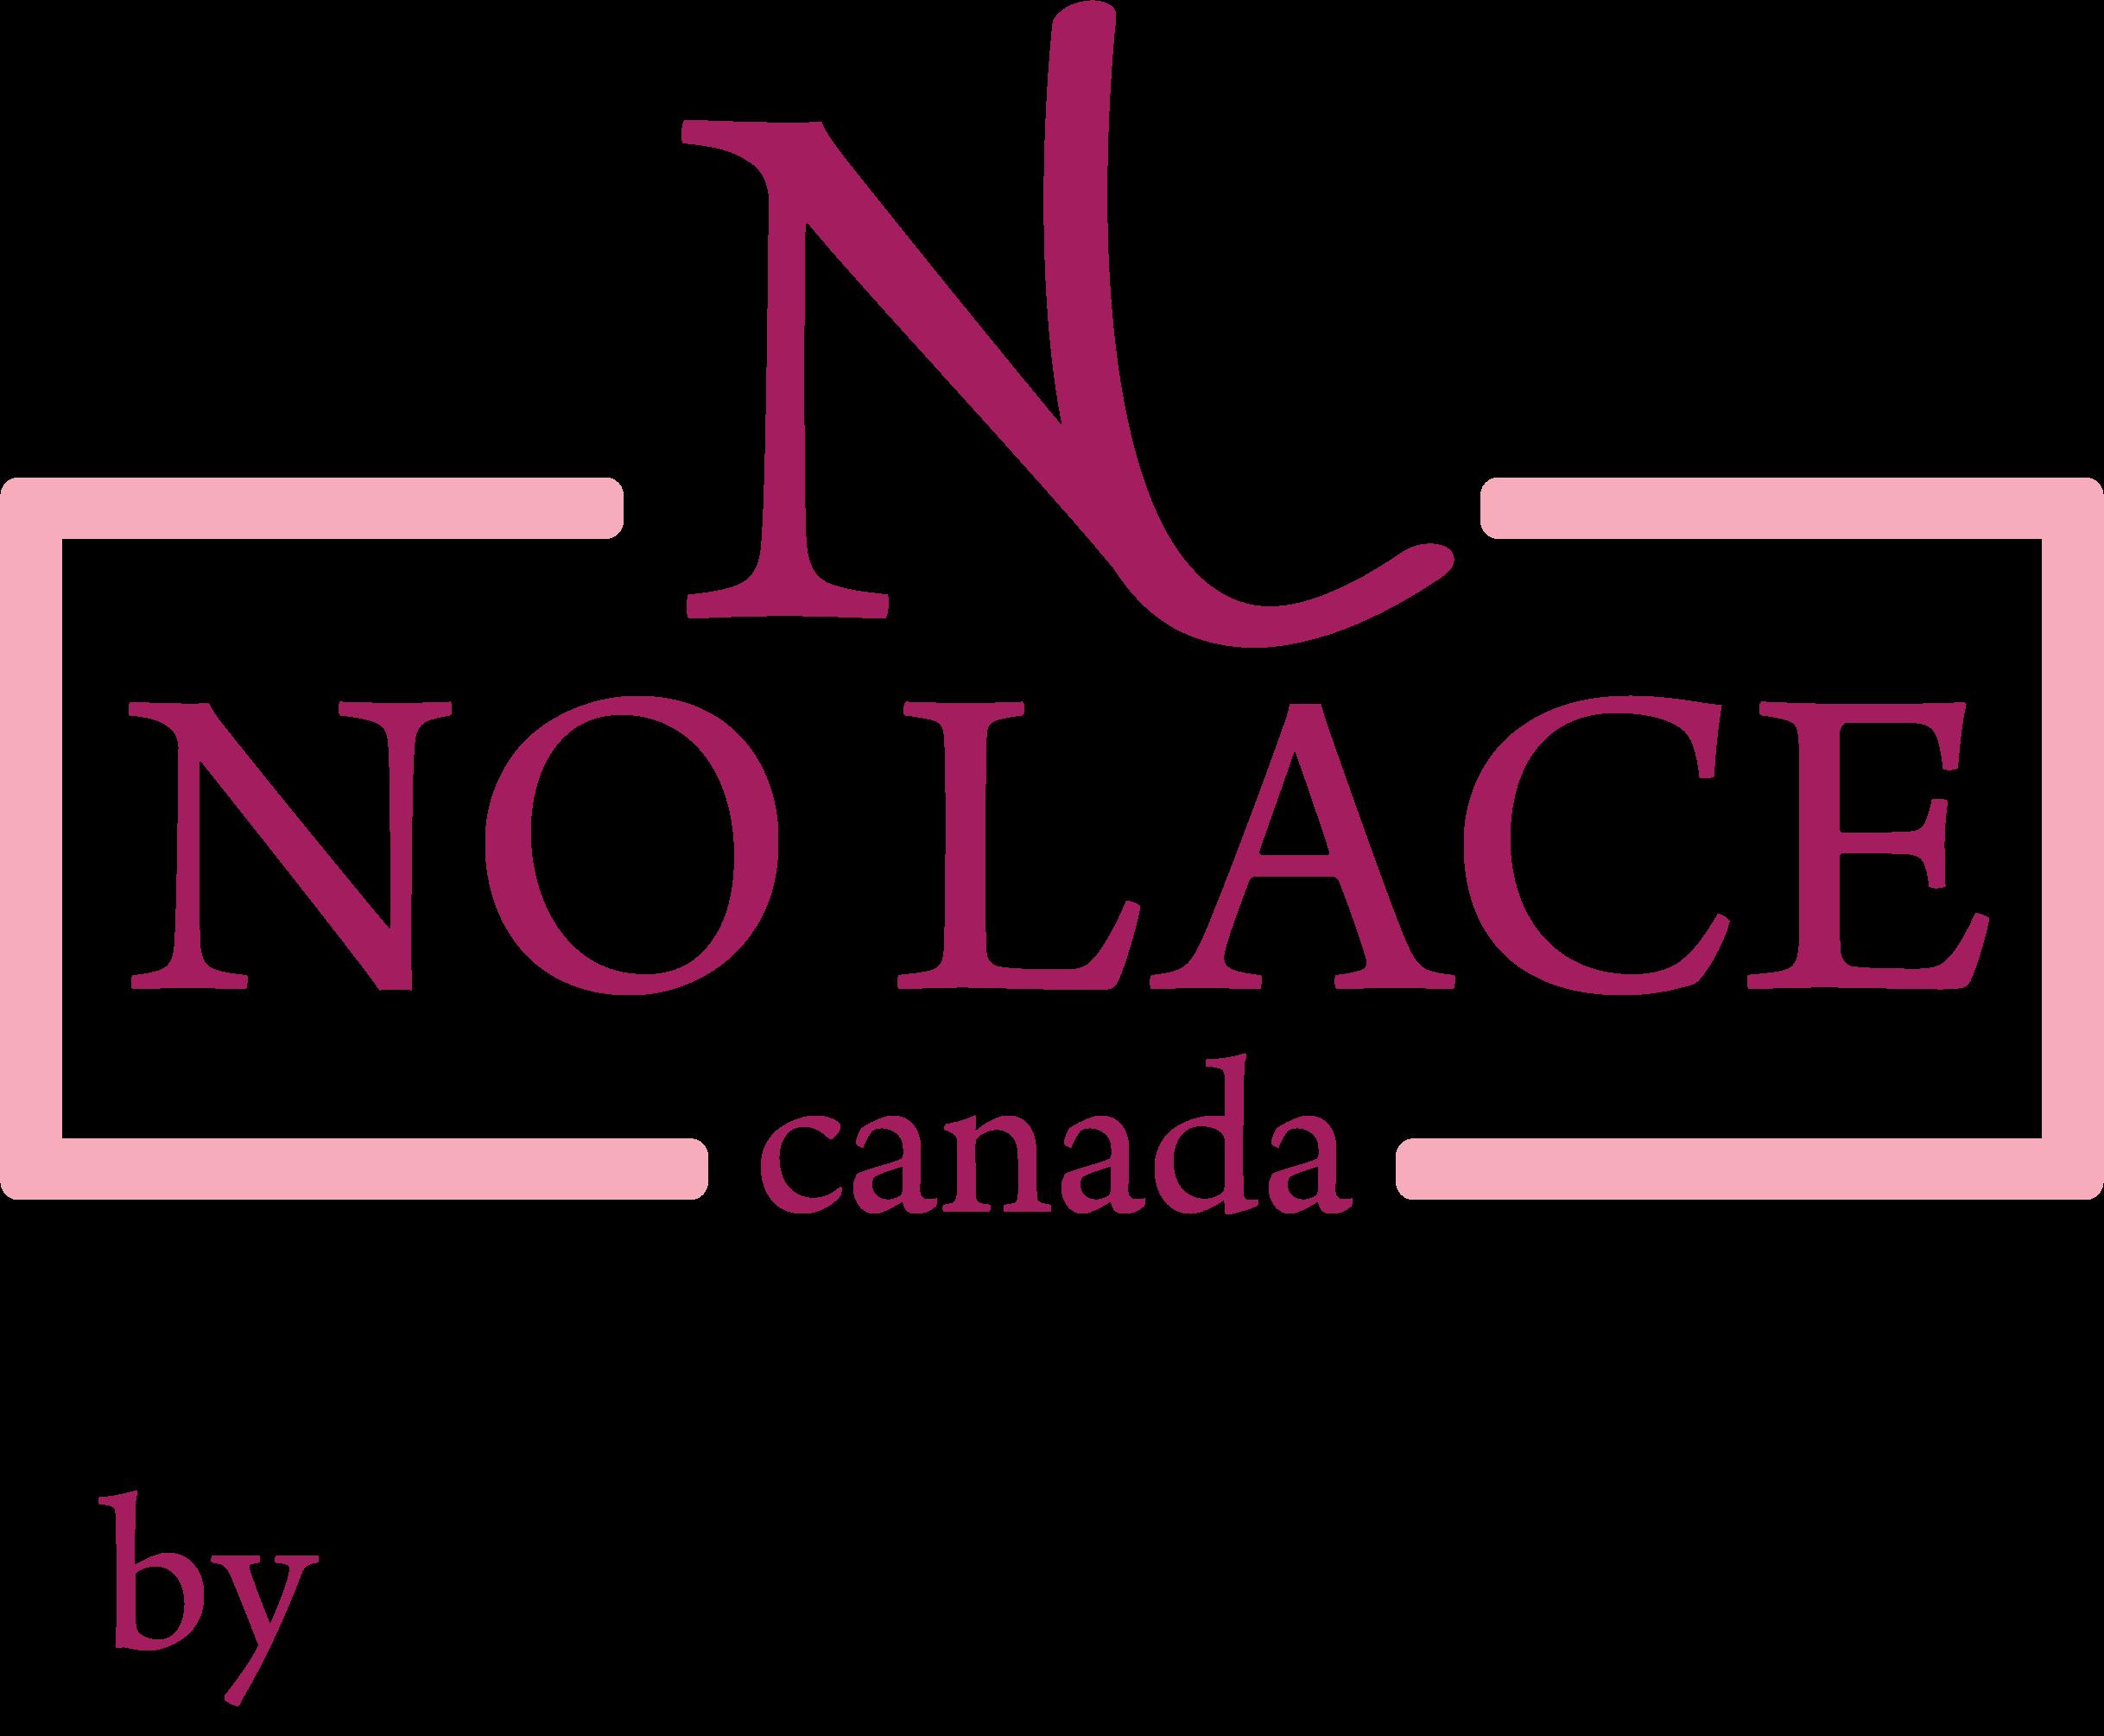 Nolace Canada